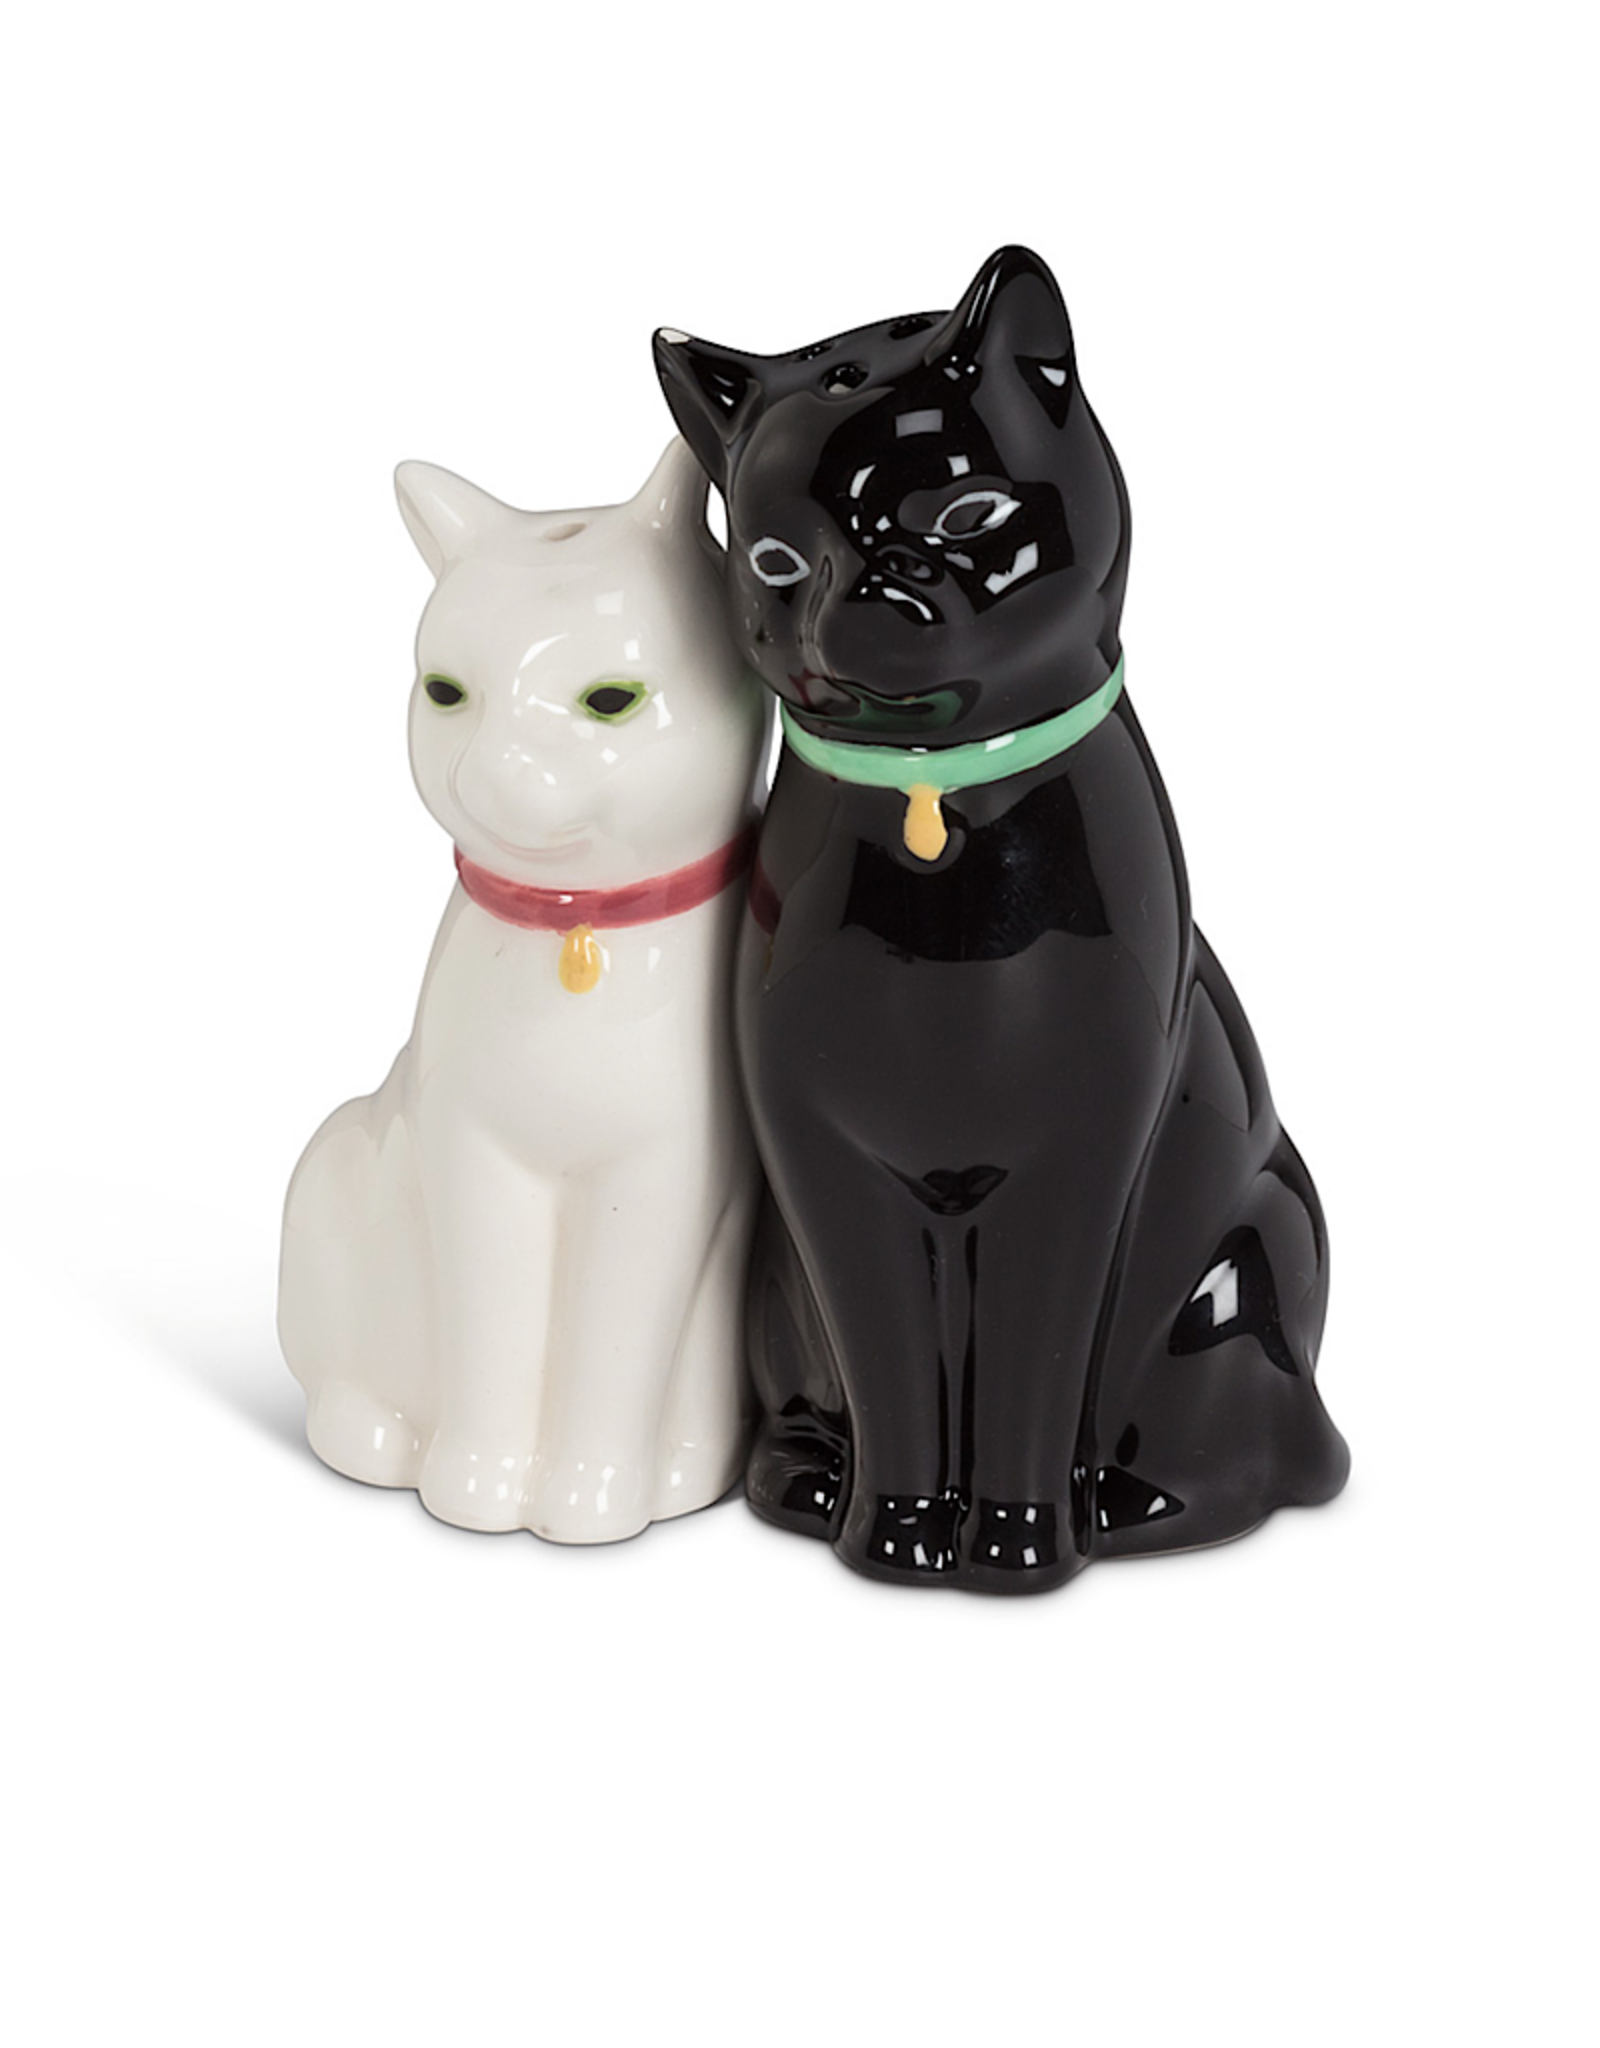 Cuddling Black White Cat Salt Pepper Shaker A Monkey Tree Emporium